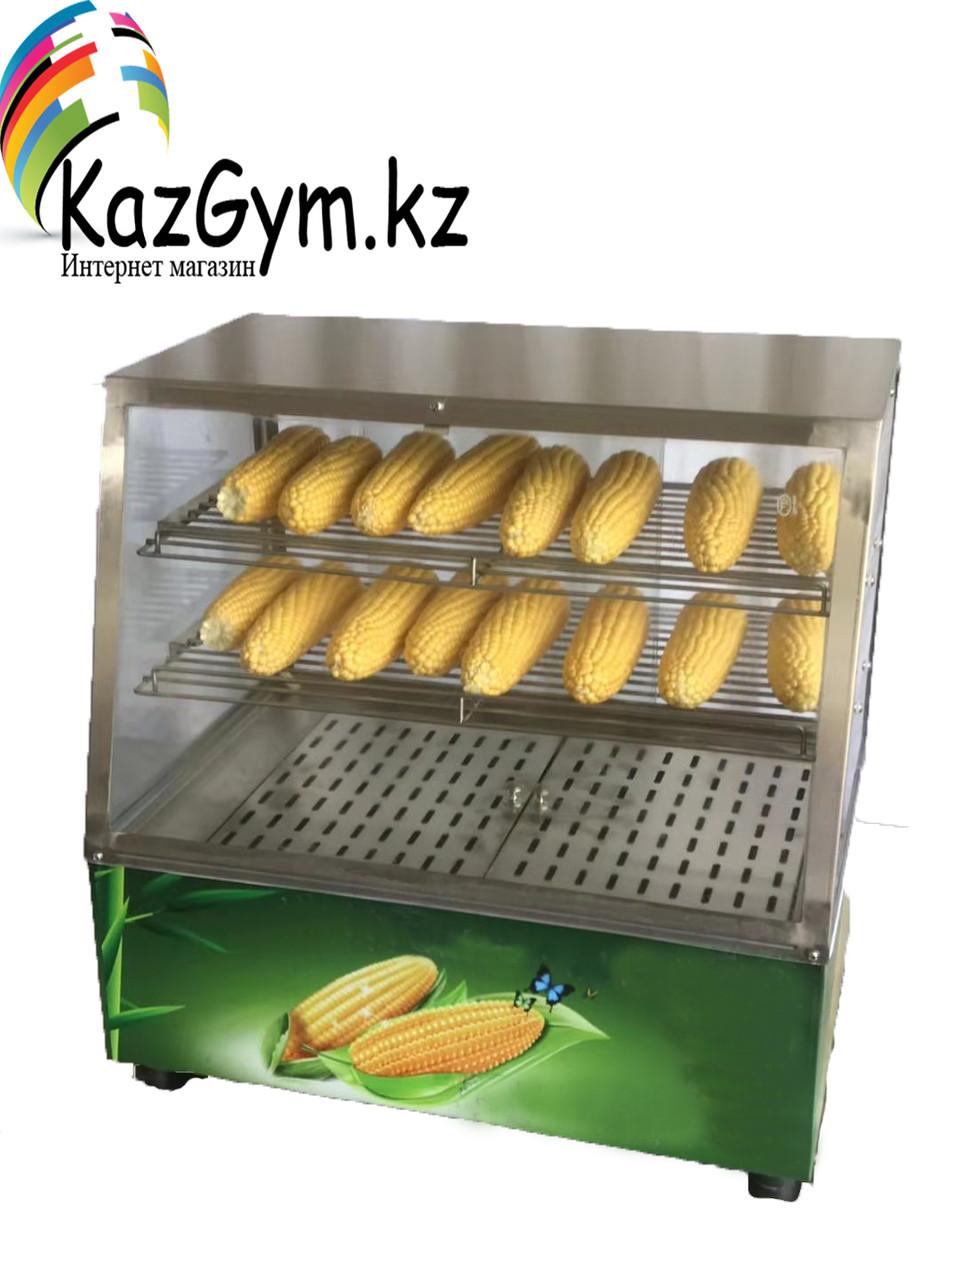 Аппарат для варки кукурузы с витриной CY-800